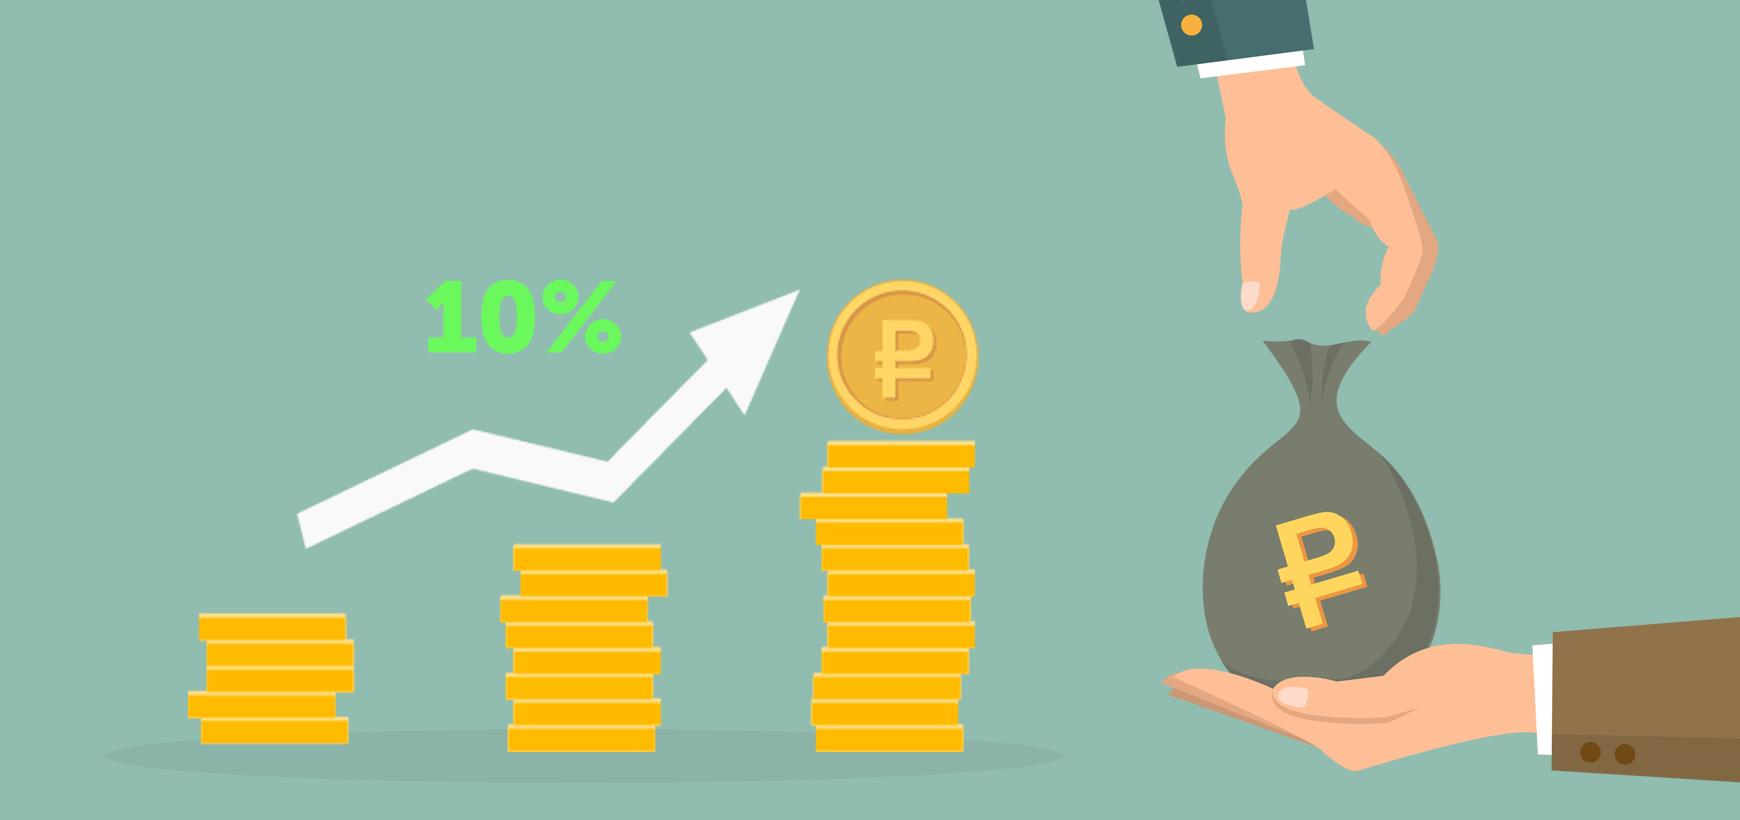 Средний размер займа «до зарплаты» вырос на 10%